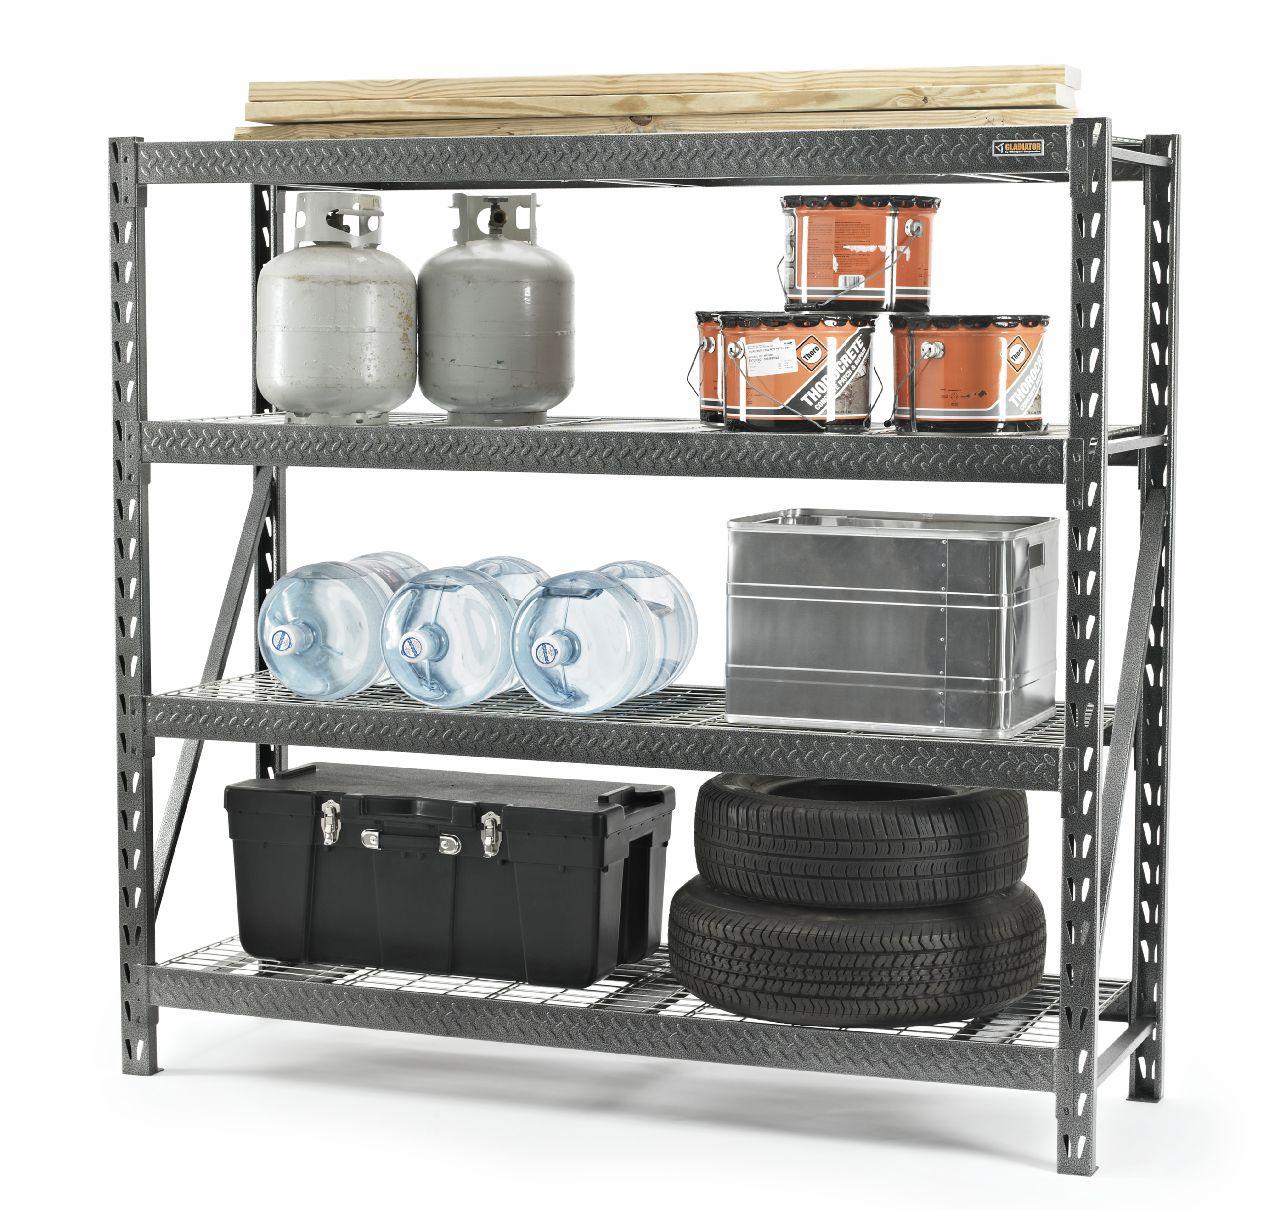 "Gladiator 77"" 4 Shelf Rack 8000 LB Capacity"